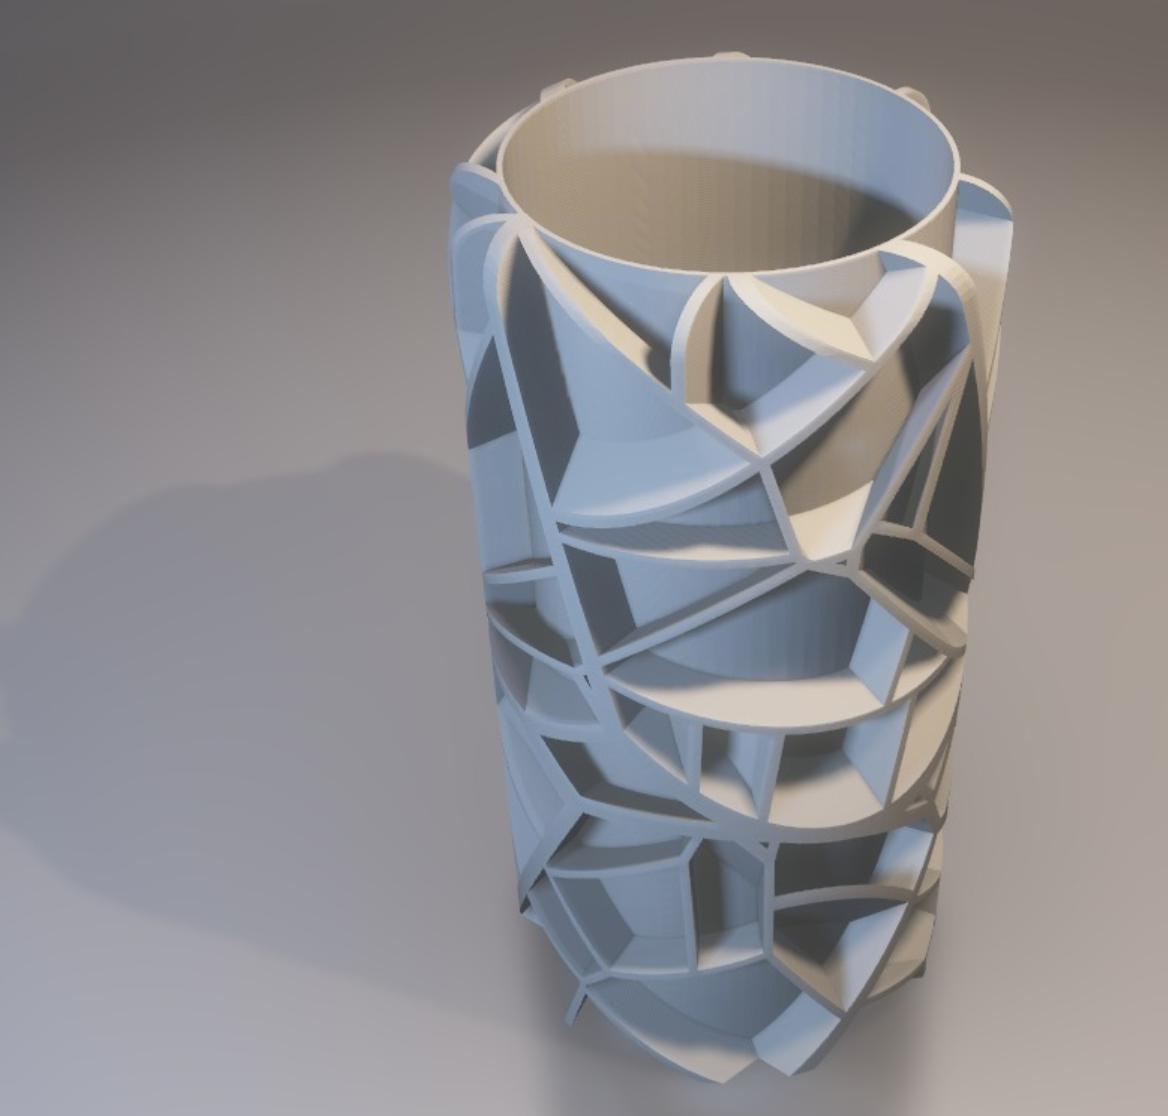 Capture d'écran 2017-11-28 à 18.40.21.png Download free STL file Voronoi vase (rounded or not) • 3D printable model, xTremePower